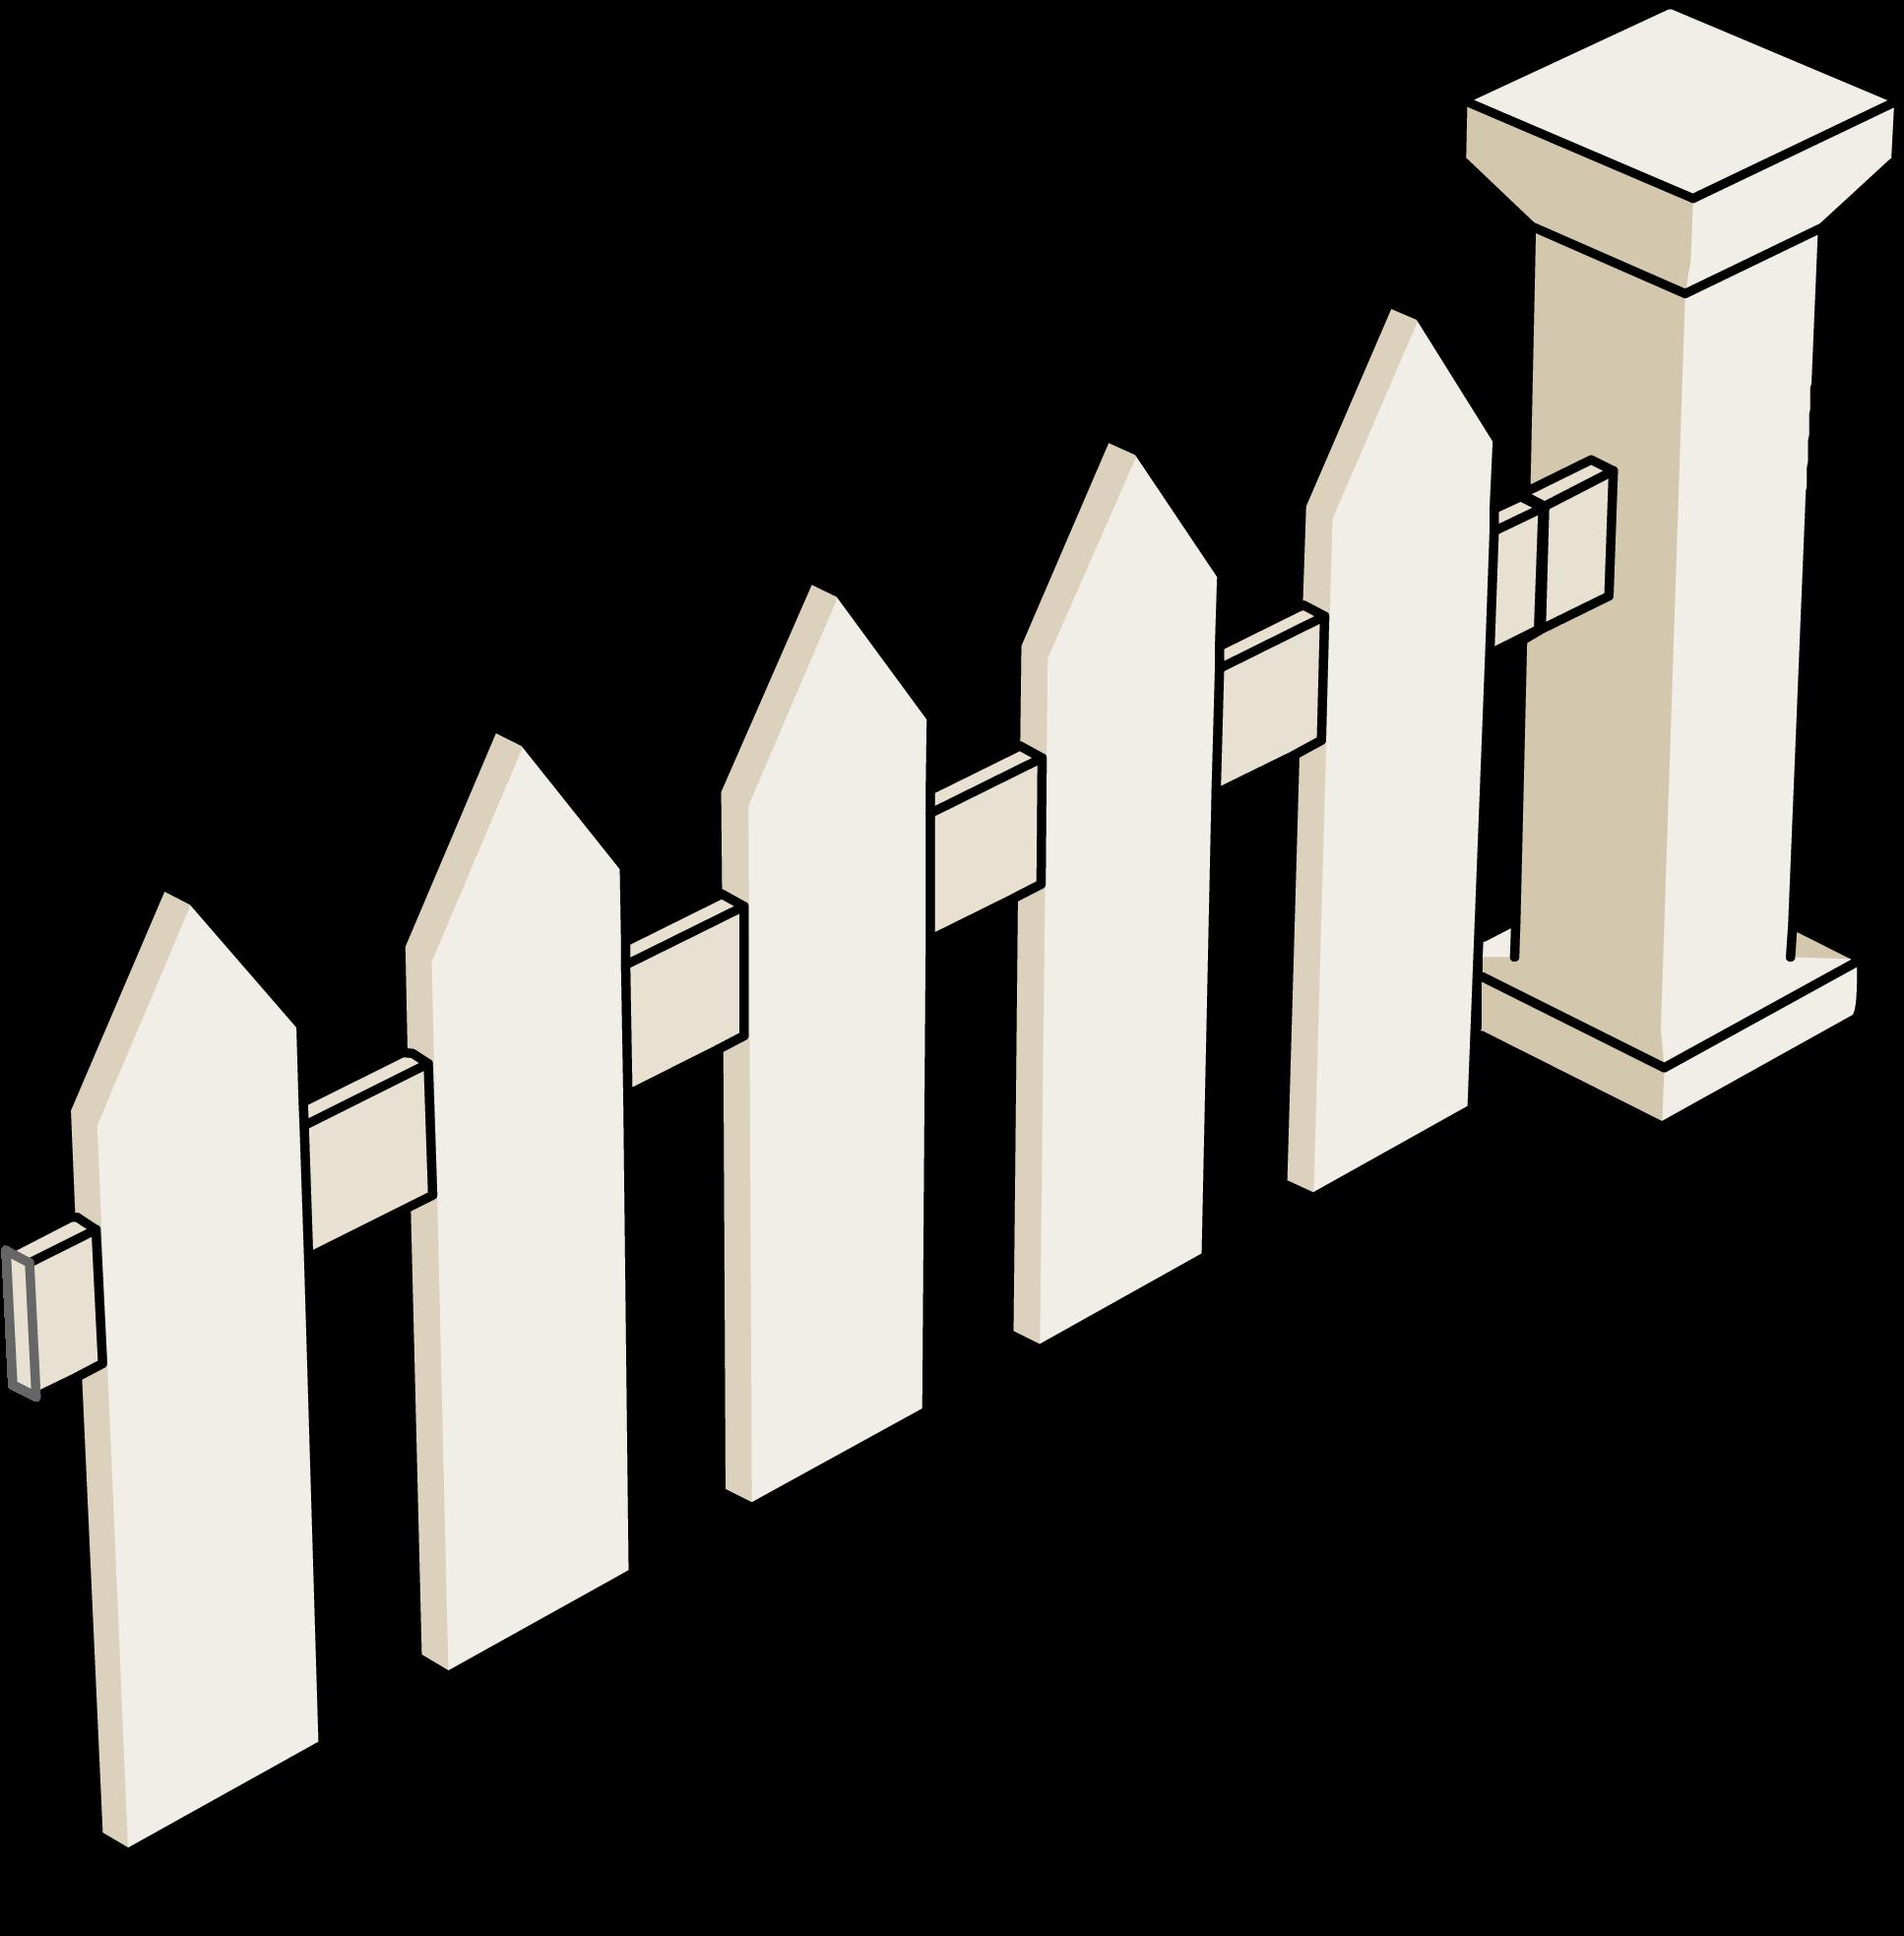 image picket fence sprite 019 club penguin wiki fandom